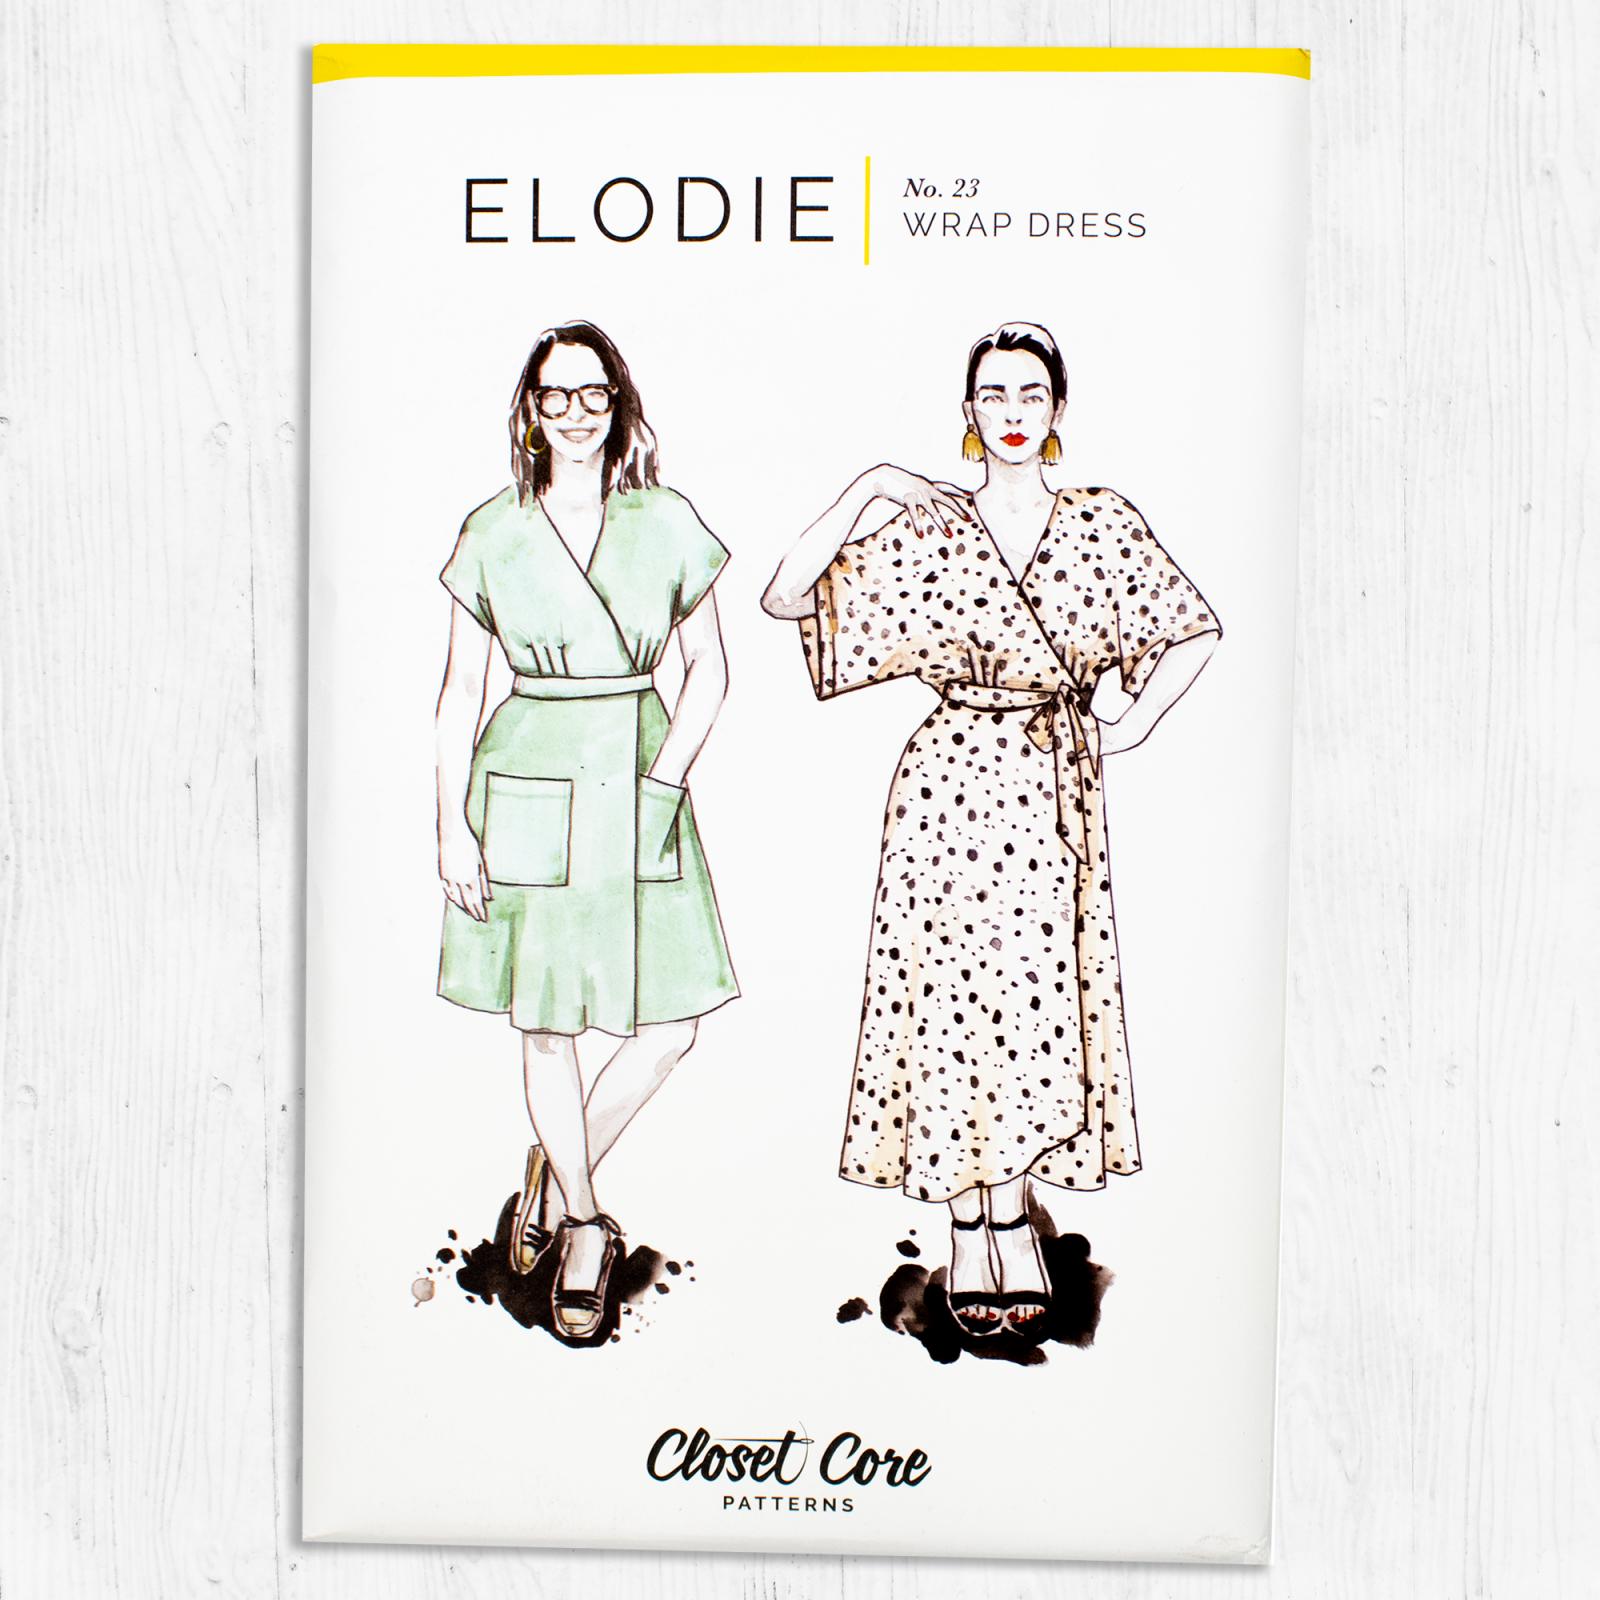 Closet Core Patterns - Elodie Wrap Dress